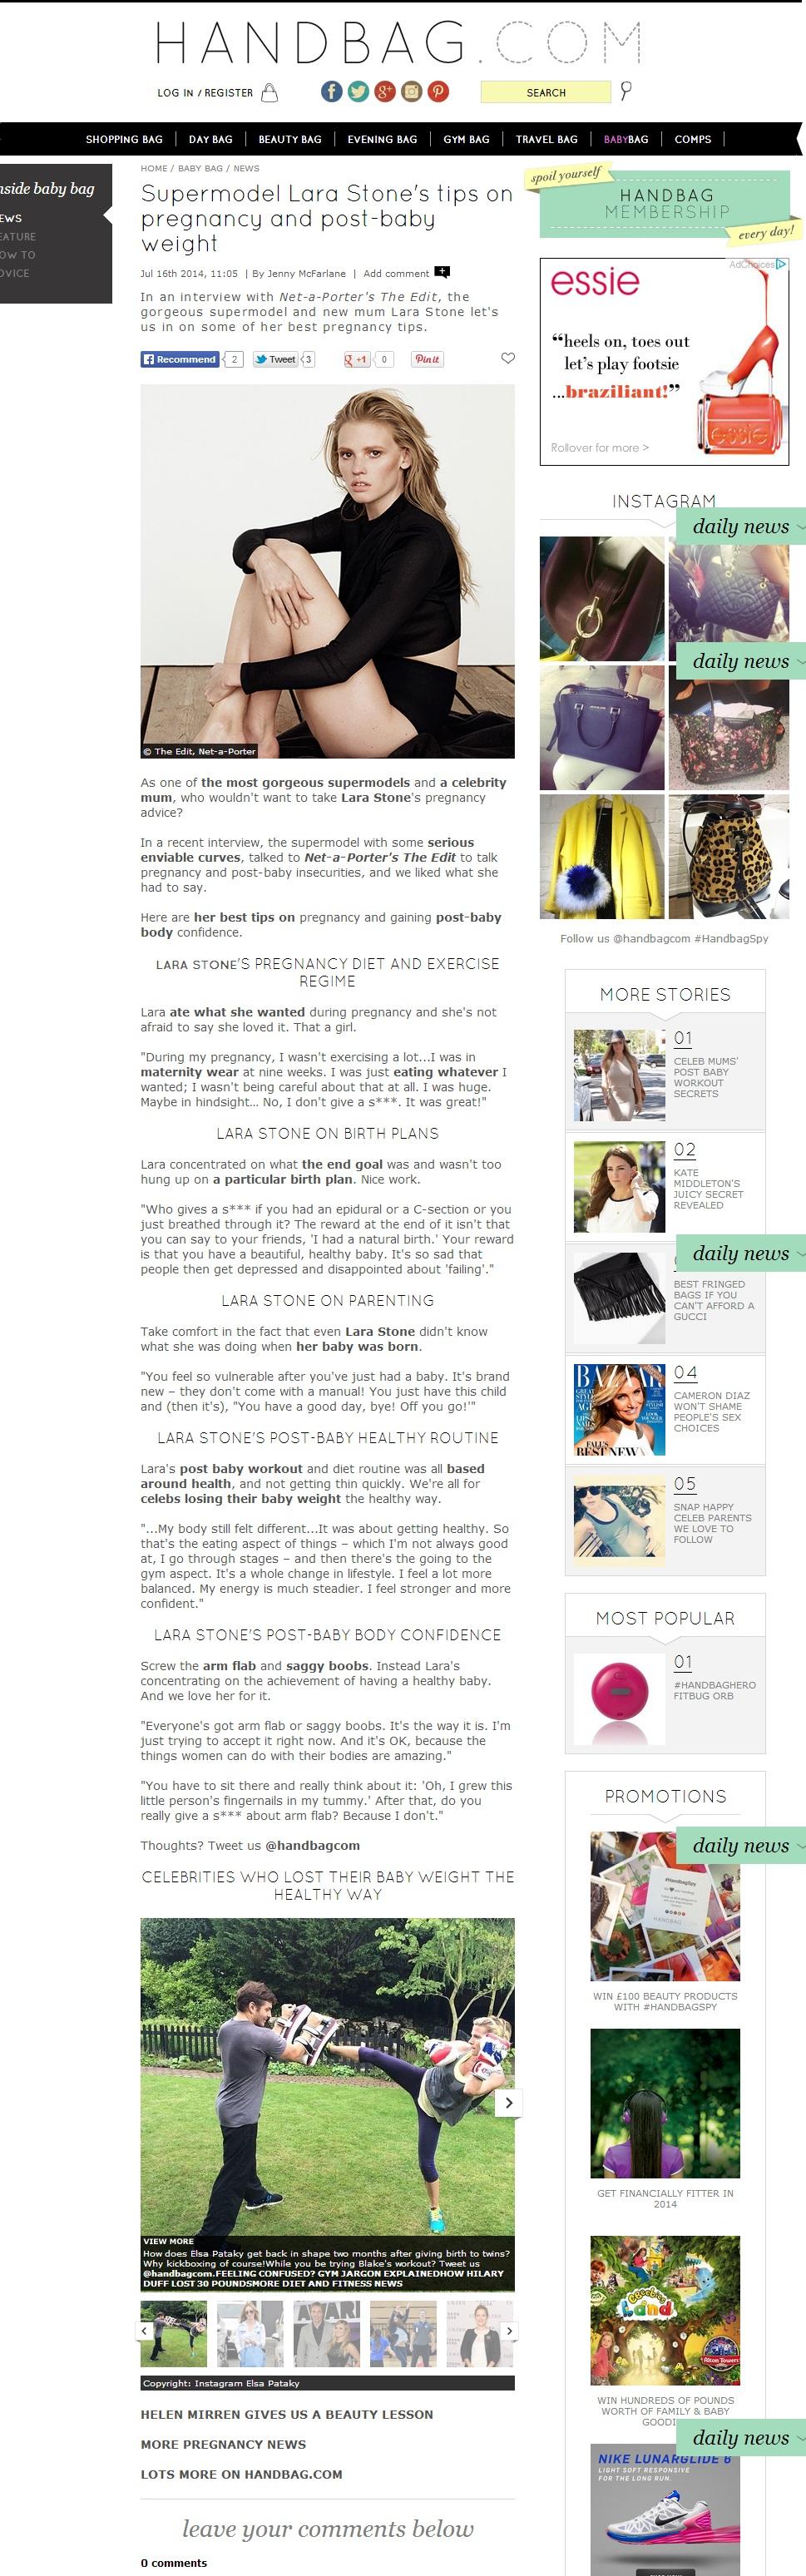 screencapture-www-handbag-com-baby-bag-news-a584479-supermodel-lara-stones-tips-on-pregnancy-and-post-baby-weight-html